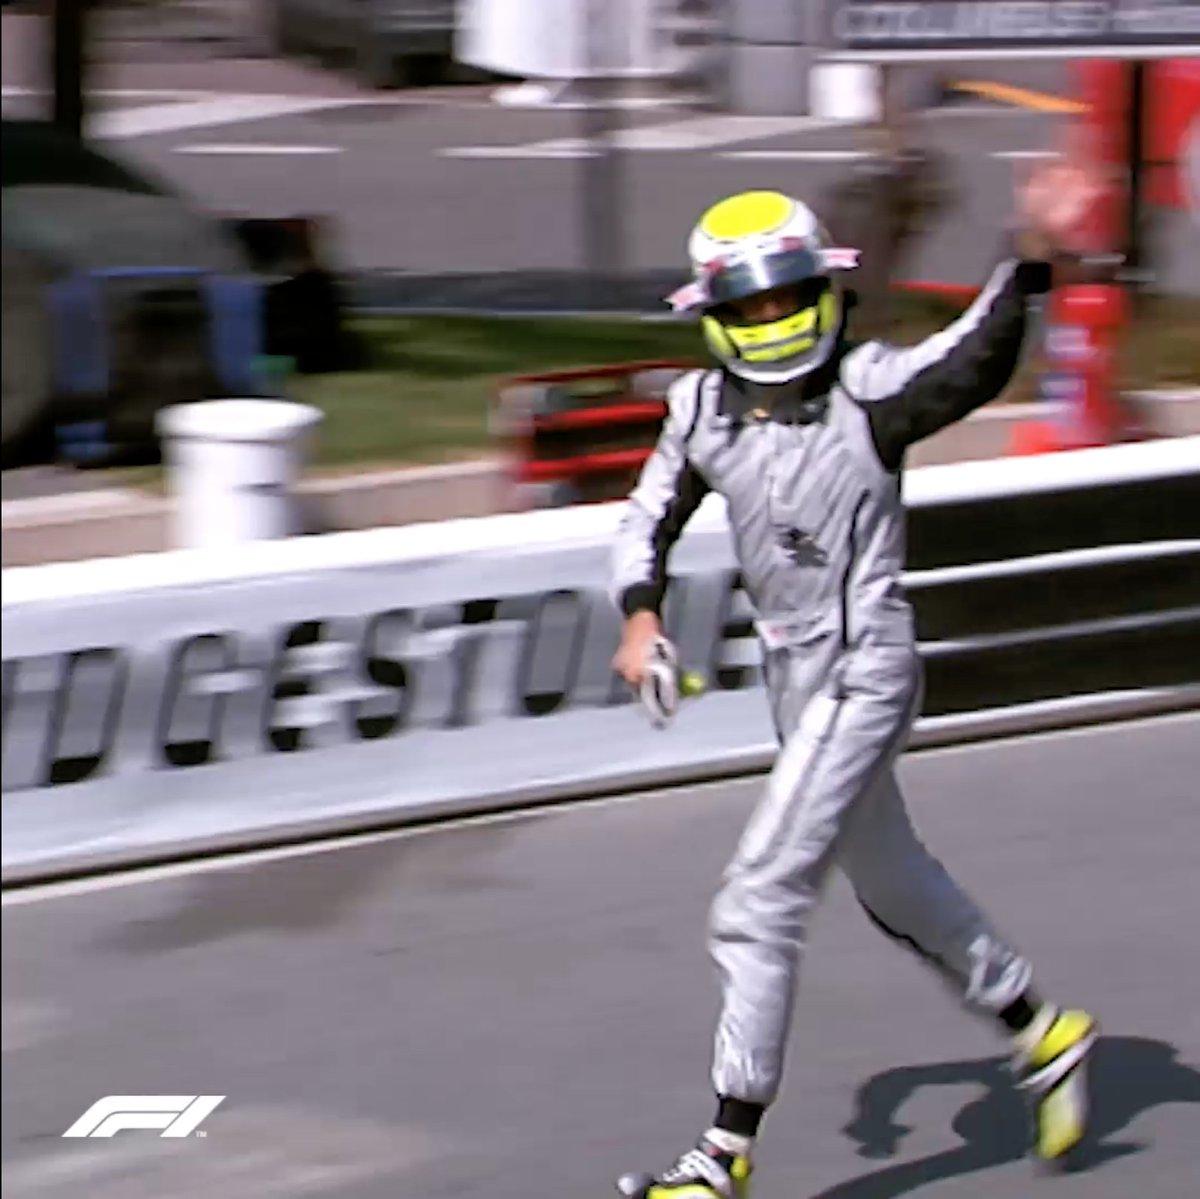 78¼ laps  @JensonButton 🏃♂️😀 #OnThisDay https://t.co/adj38mYimt